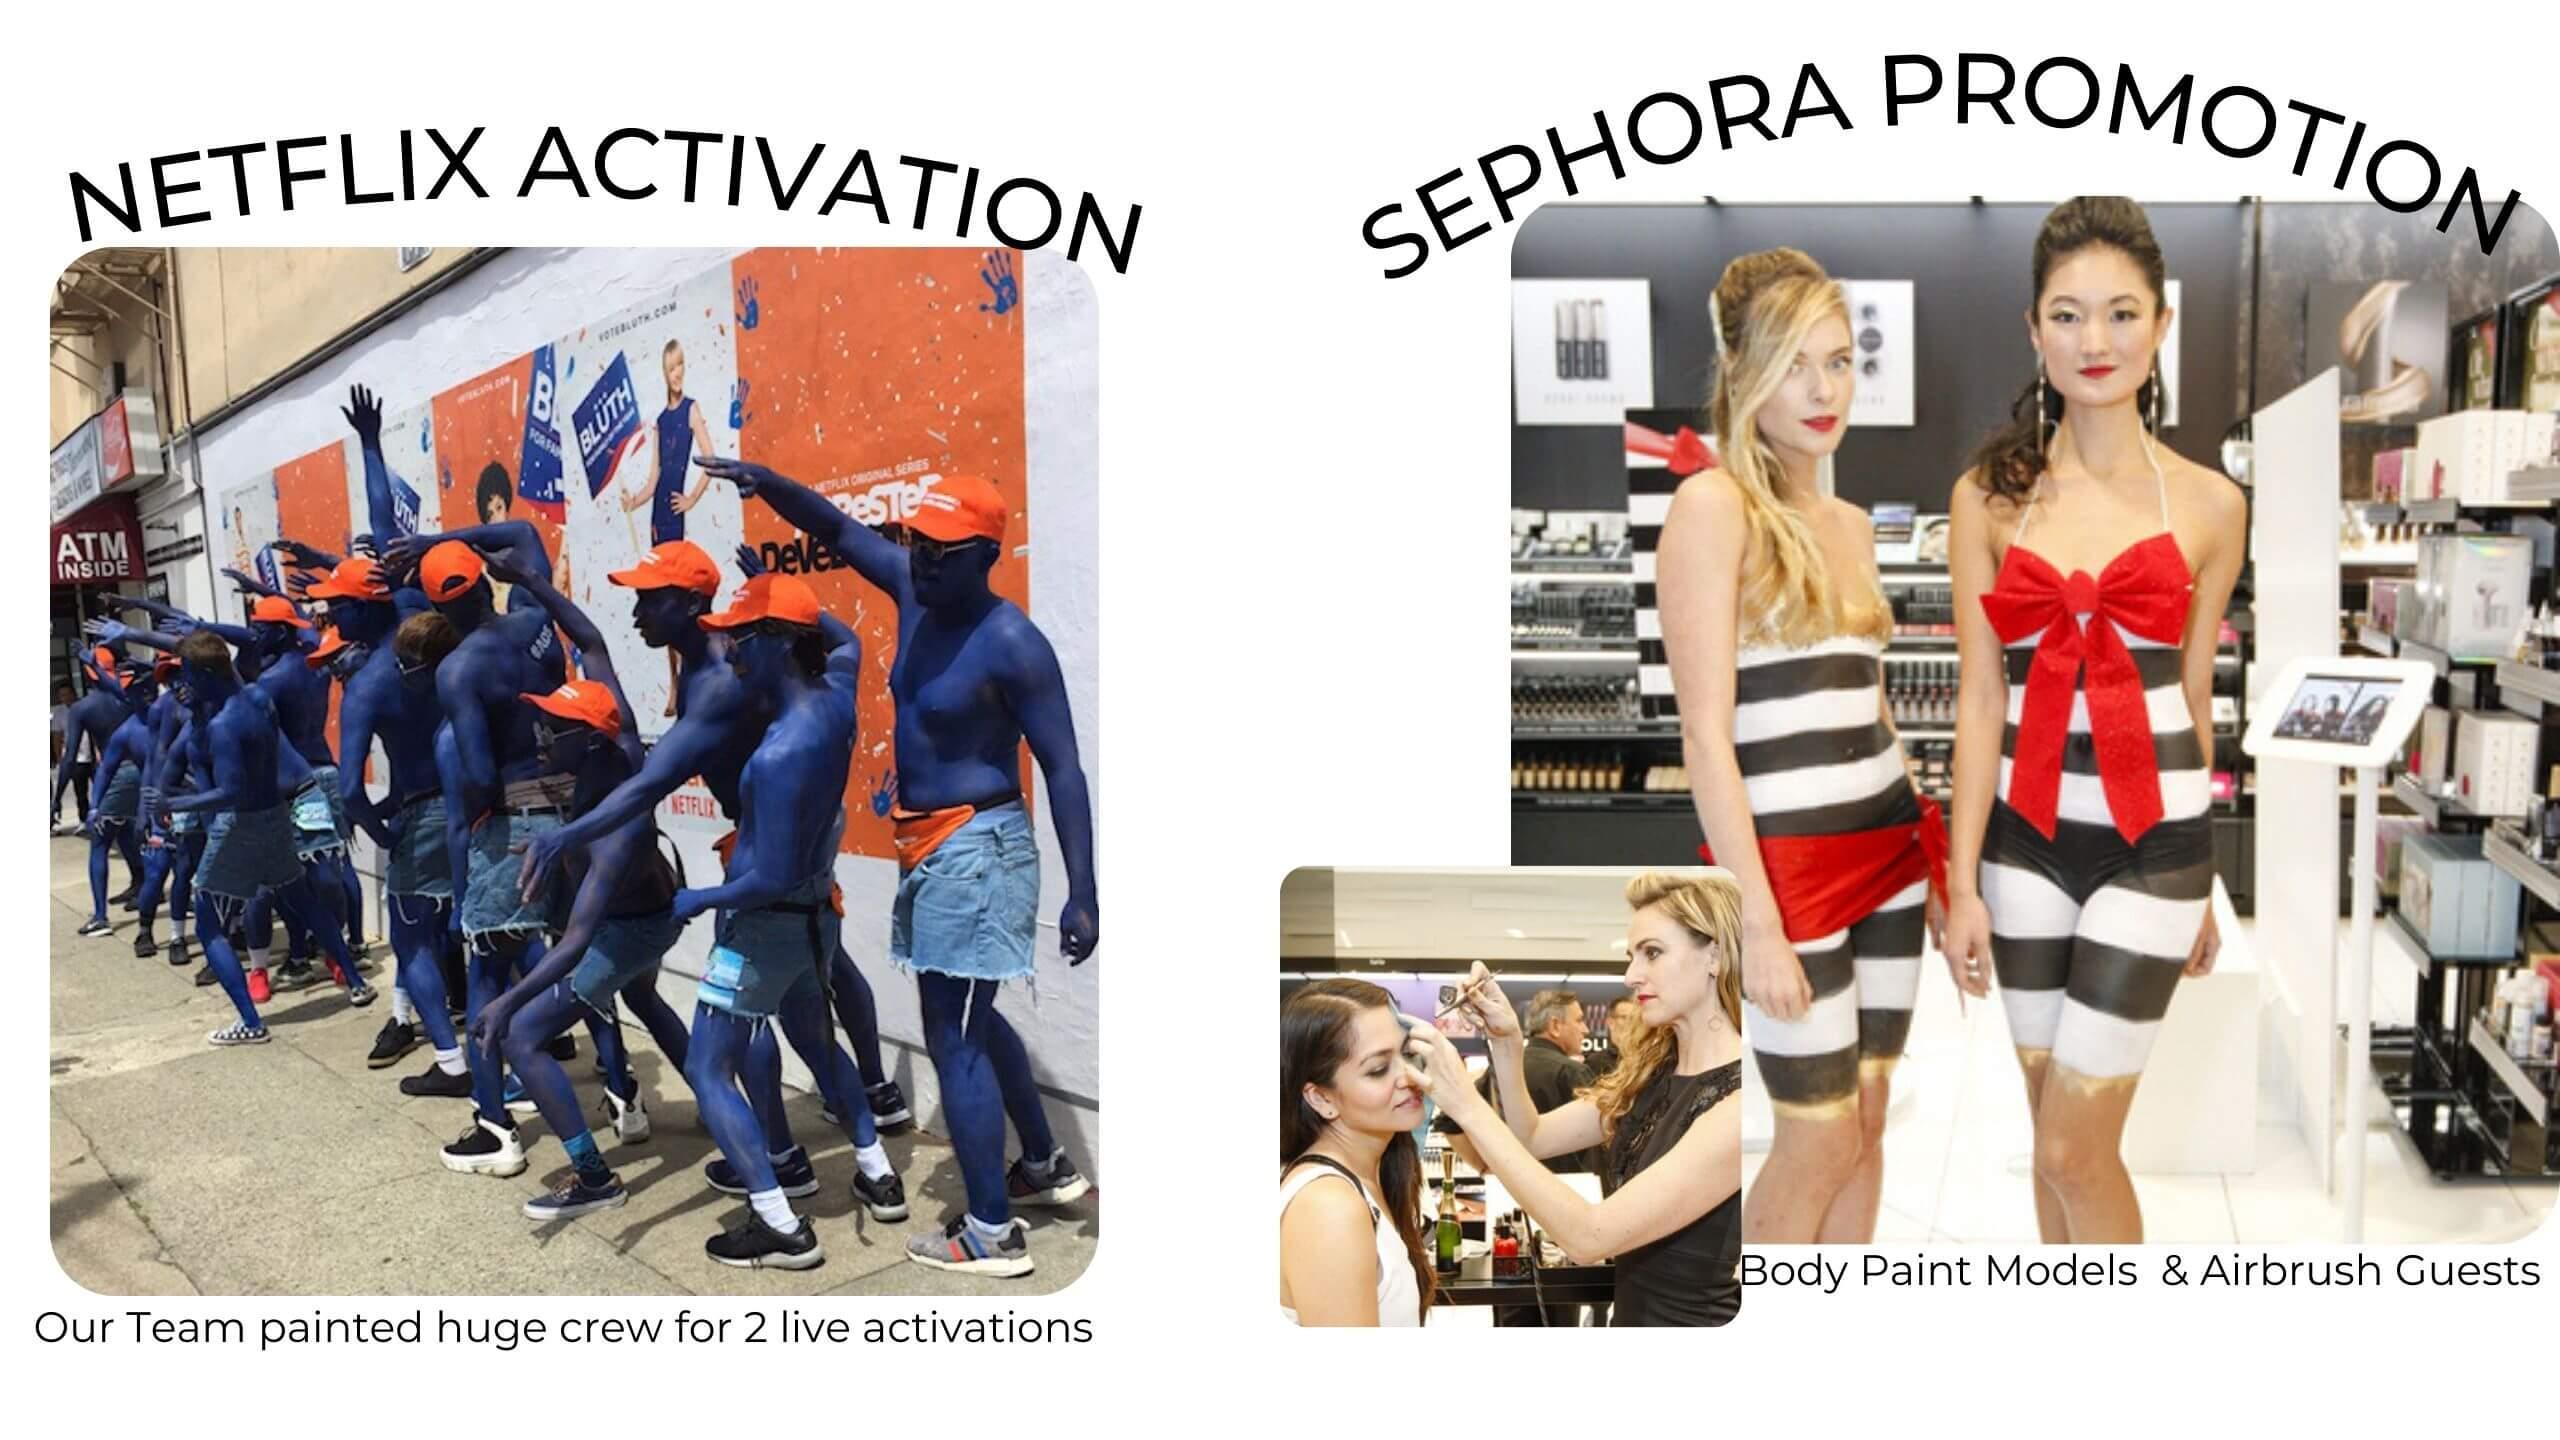 Corporate clients for Body Paint- Netflix & Sephora activations